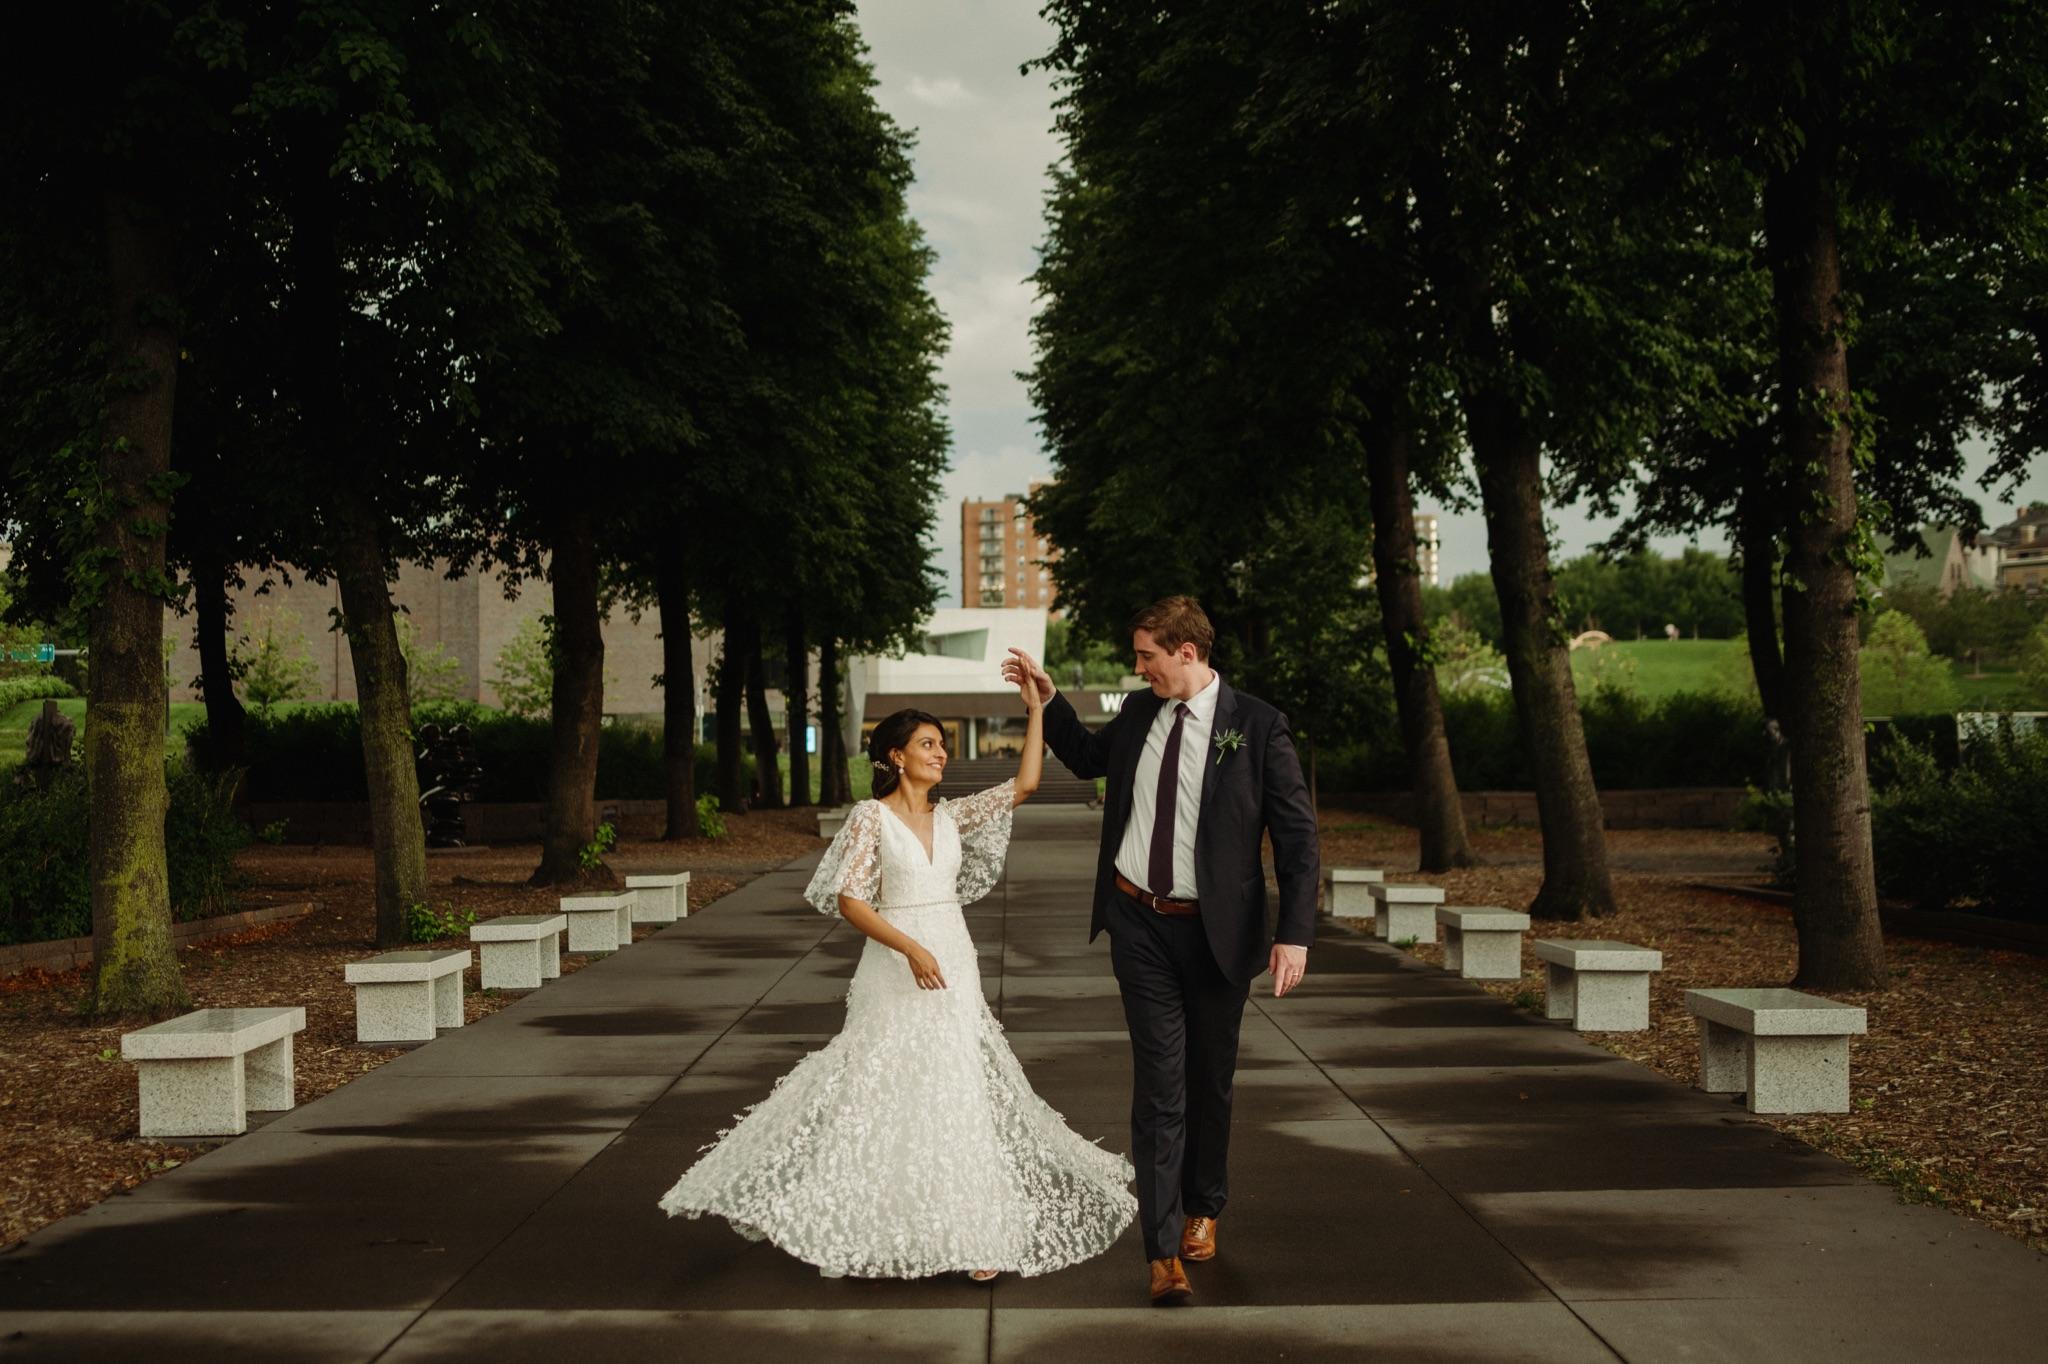 Groom spinning bride outside on sidewalk with trees in background walker art center wedding